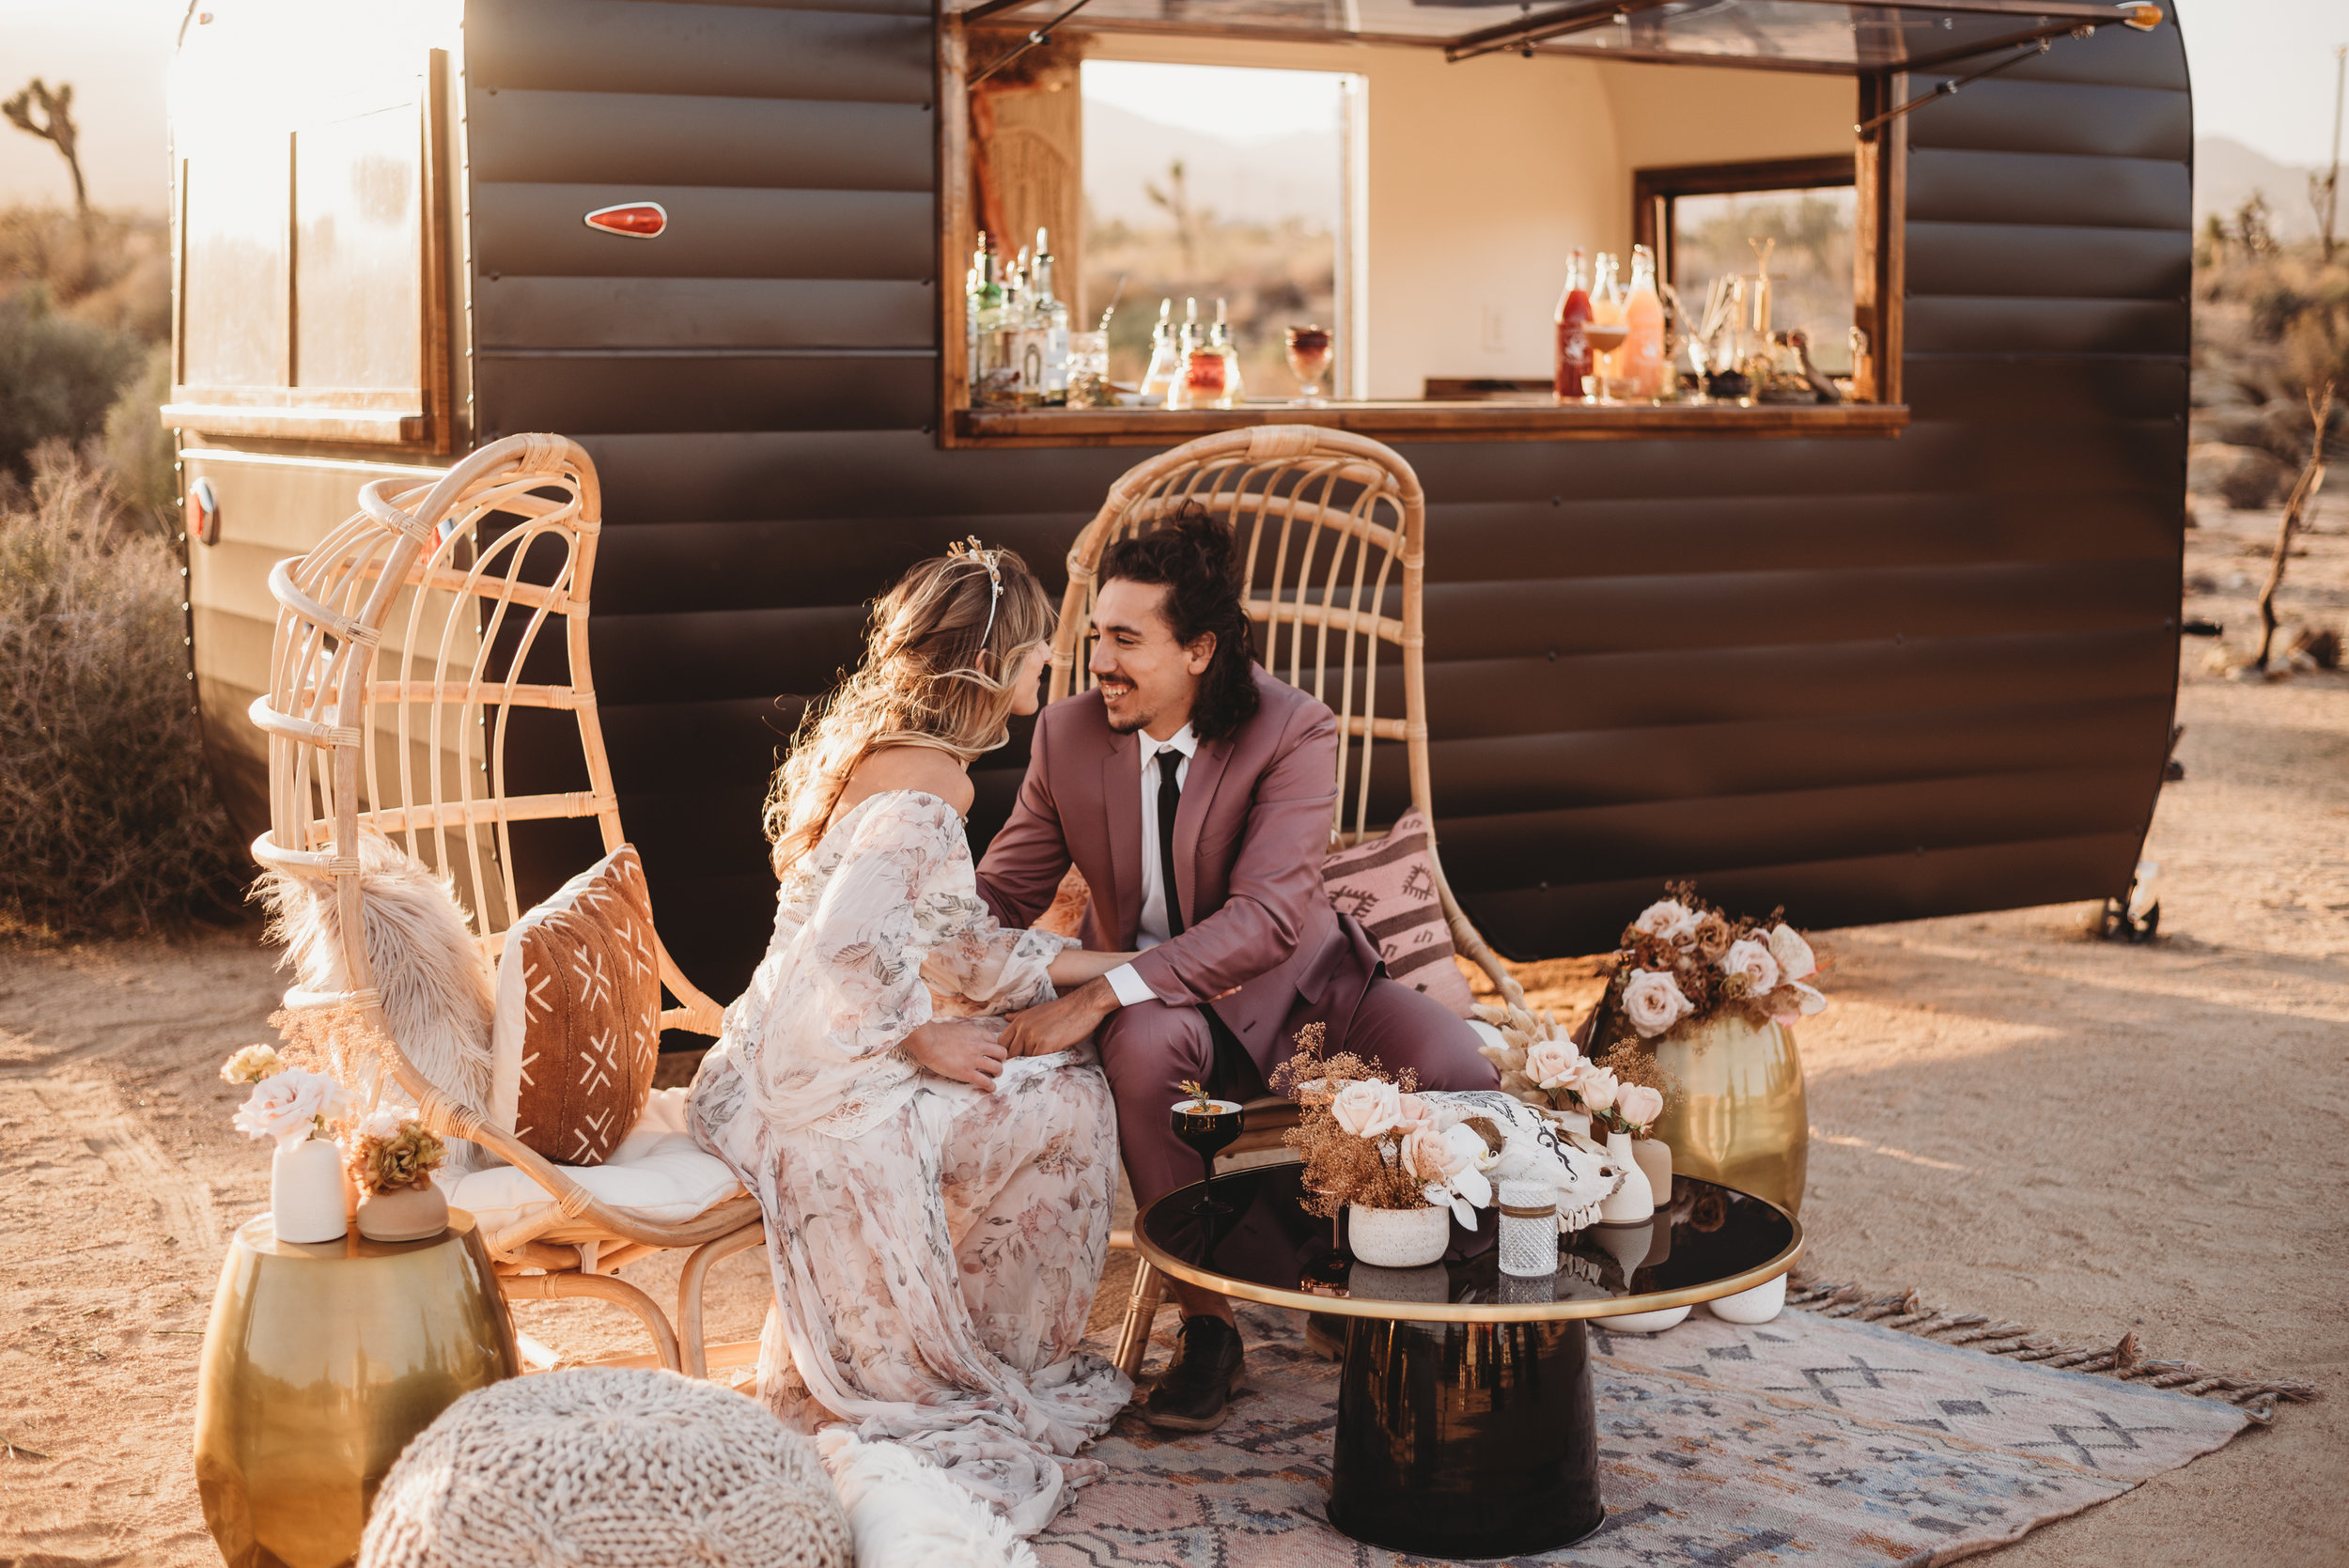 FortSt.John_photographer_TyraEPhotography_Wedding_Couple_Family_Photograhy_DawsonCreek_Elopement_Bride_Boduoir_Portraits-8303.jpg